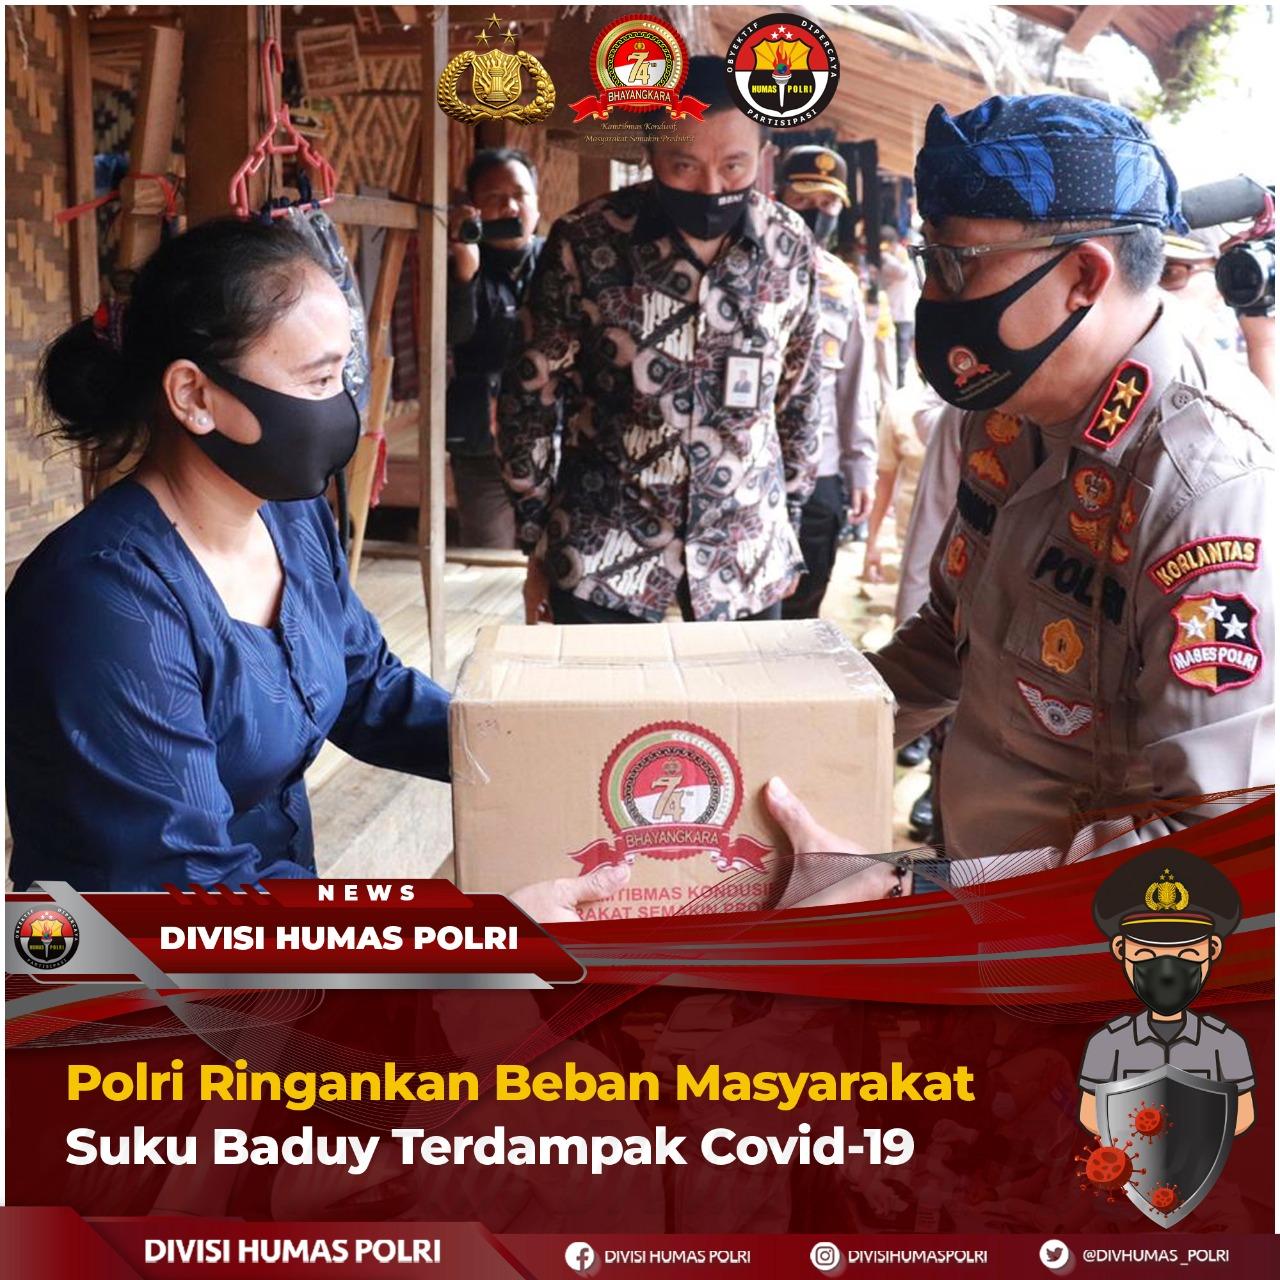 Polri Gelar Baksos Ringankan Beban Masyarakat Suku Baduy Terdampak Covid-19 di Banten